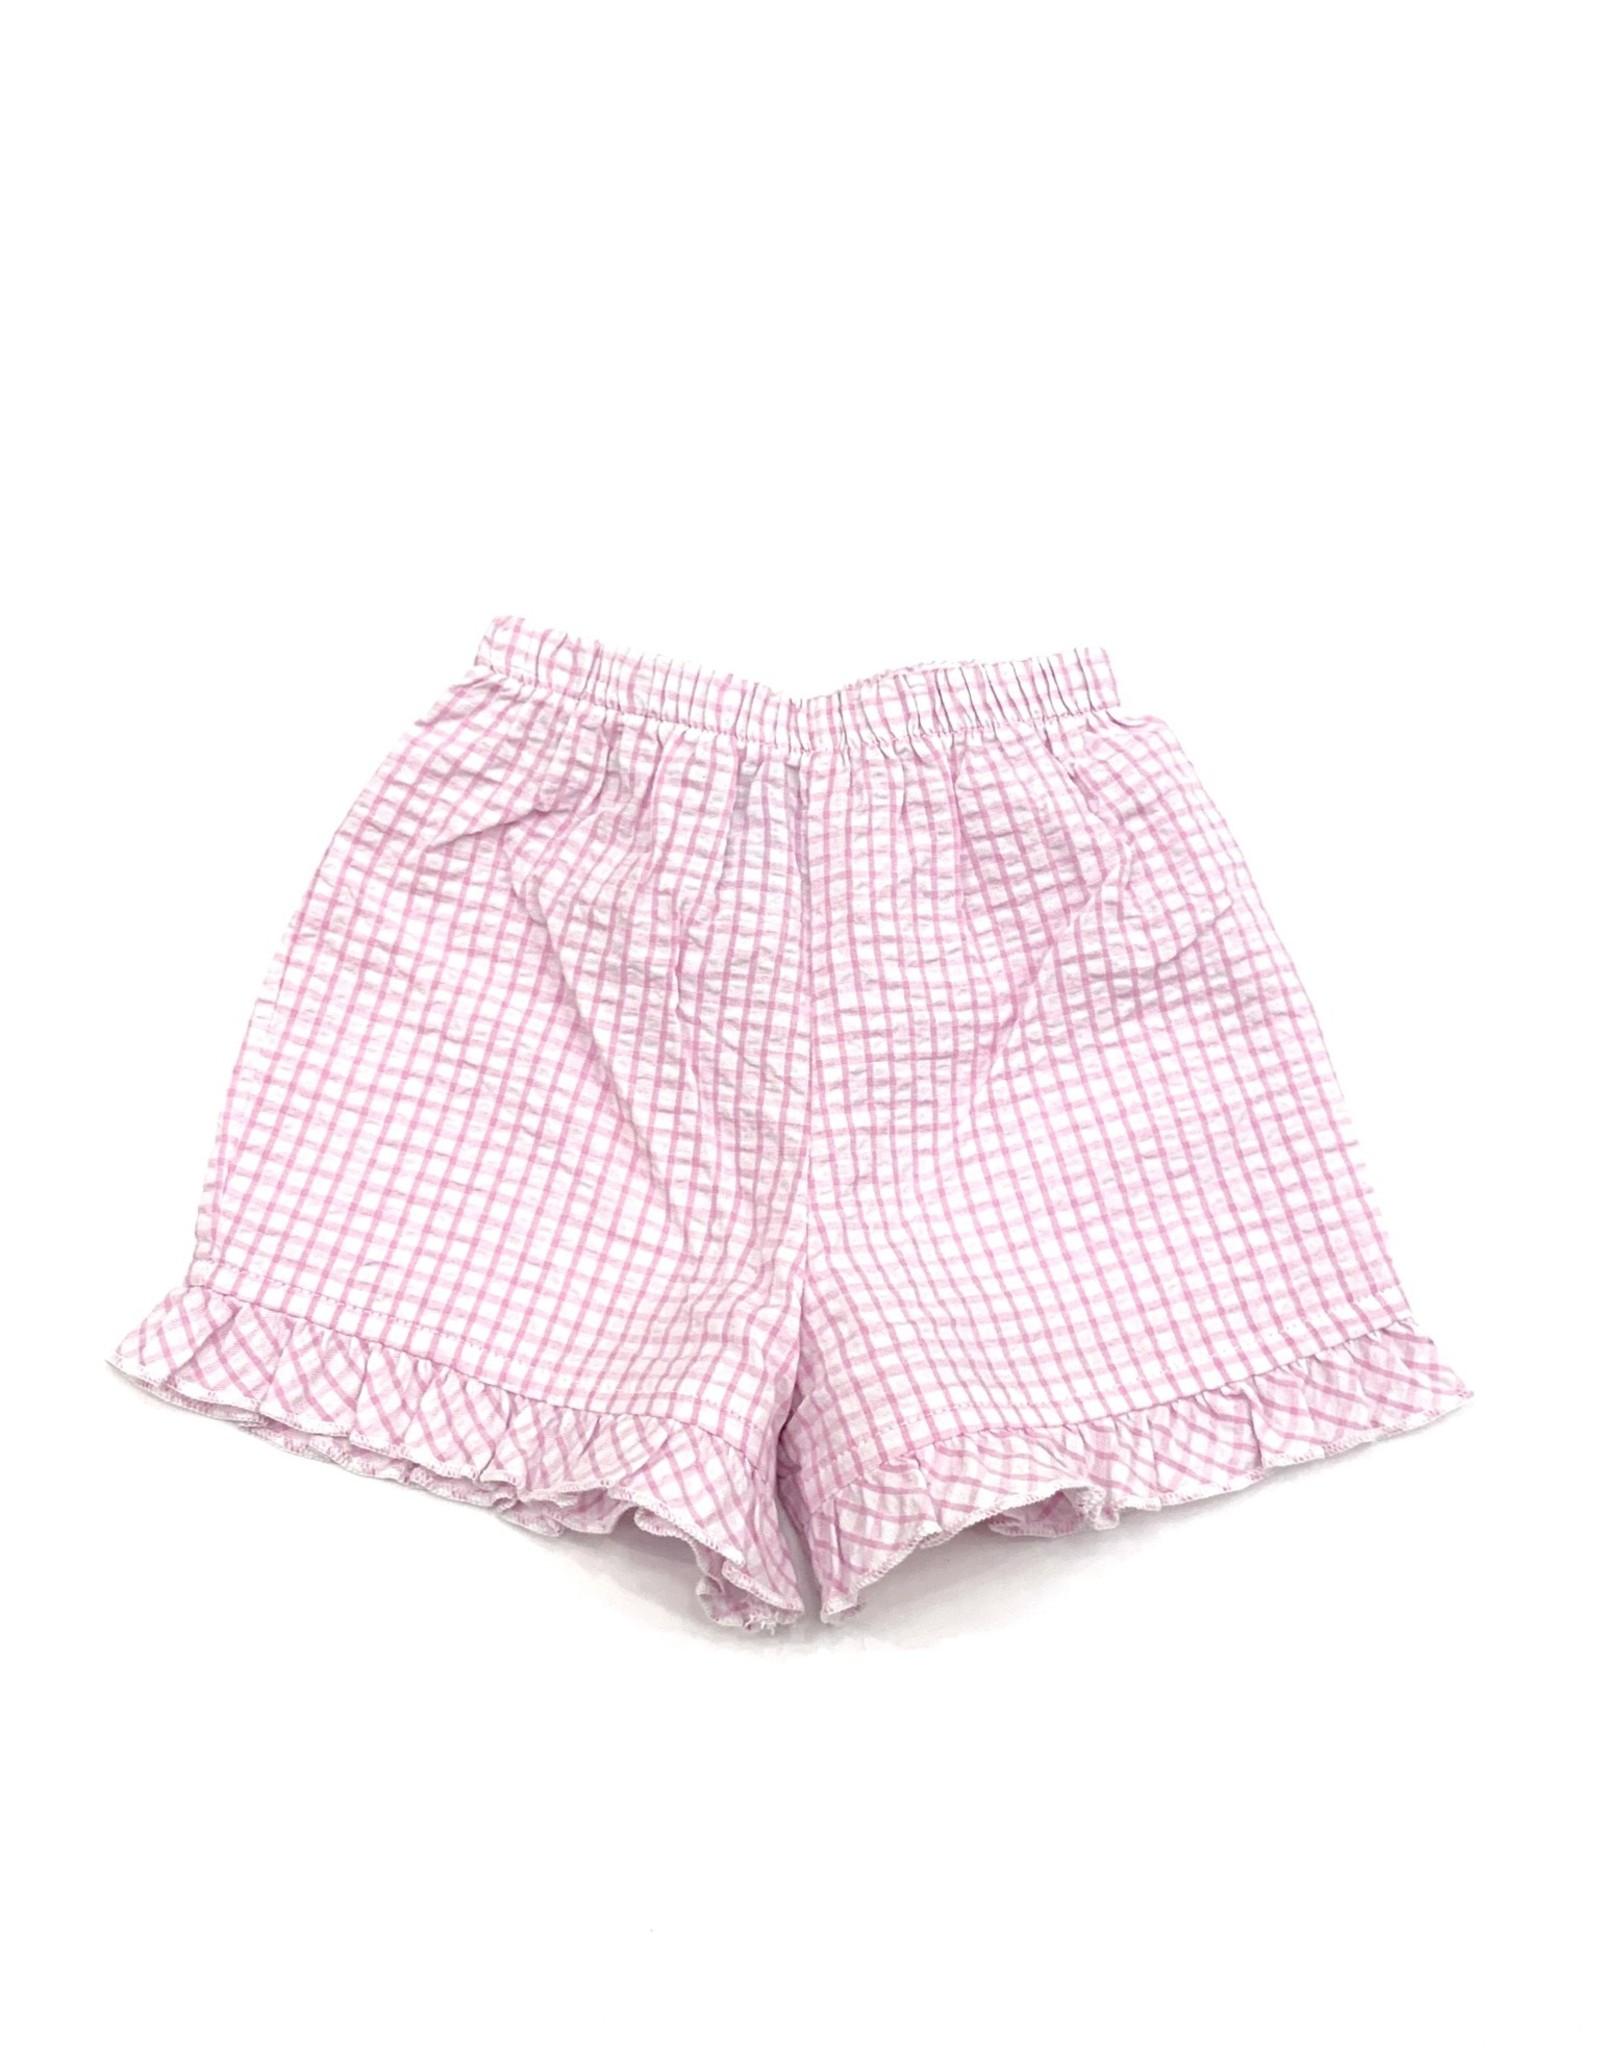 The Bailey Boys Light Pink Windowpane, Short With Ruffle